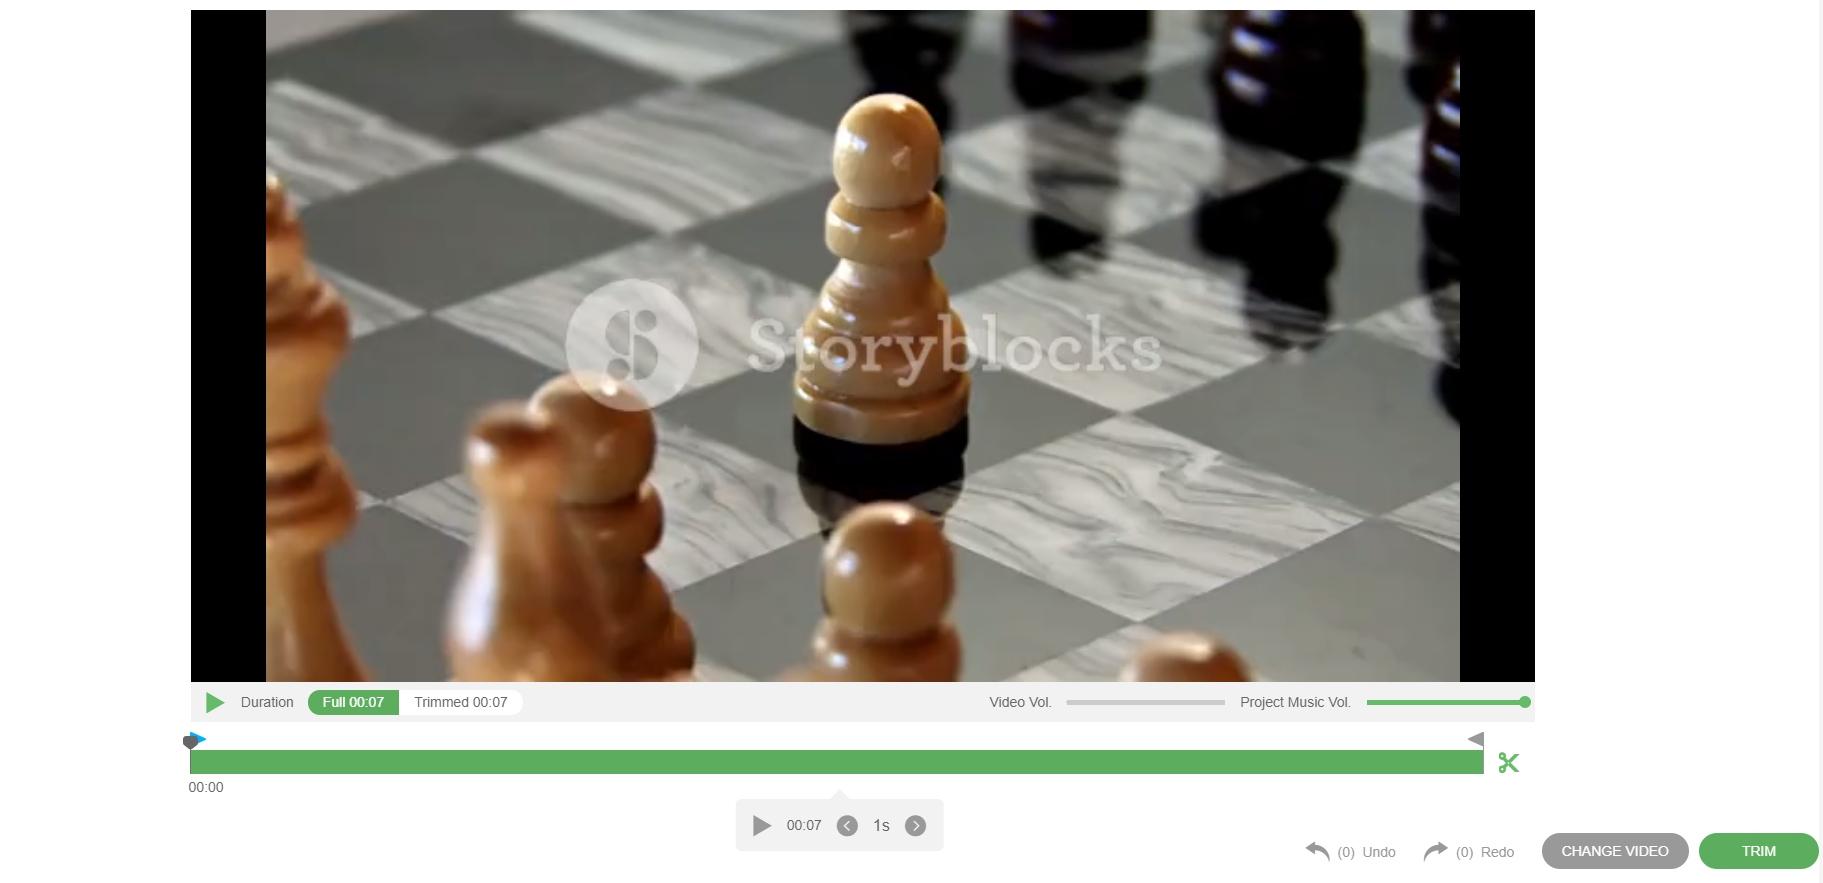 Chess Stock Video